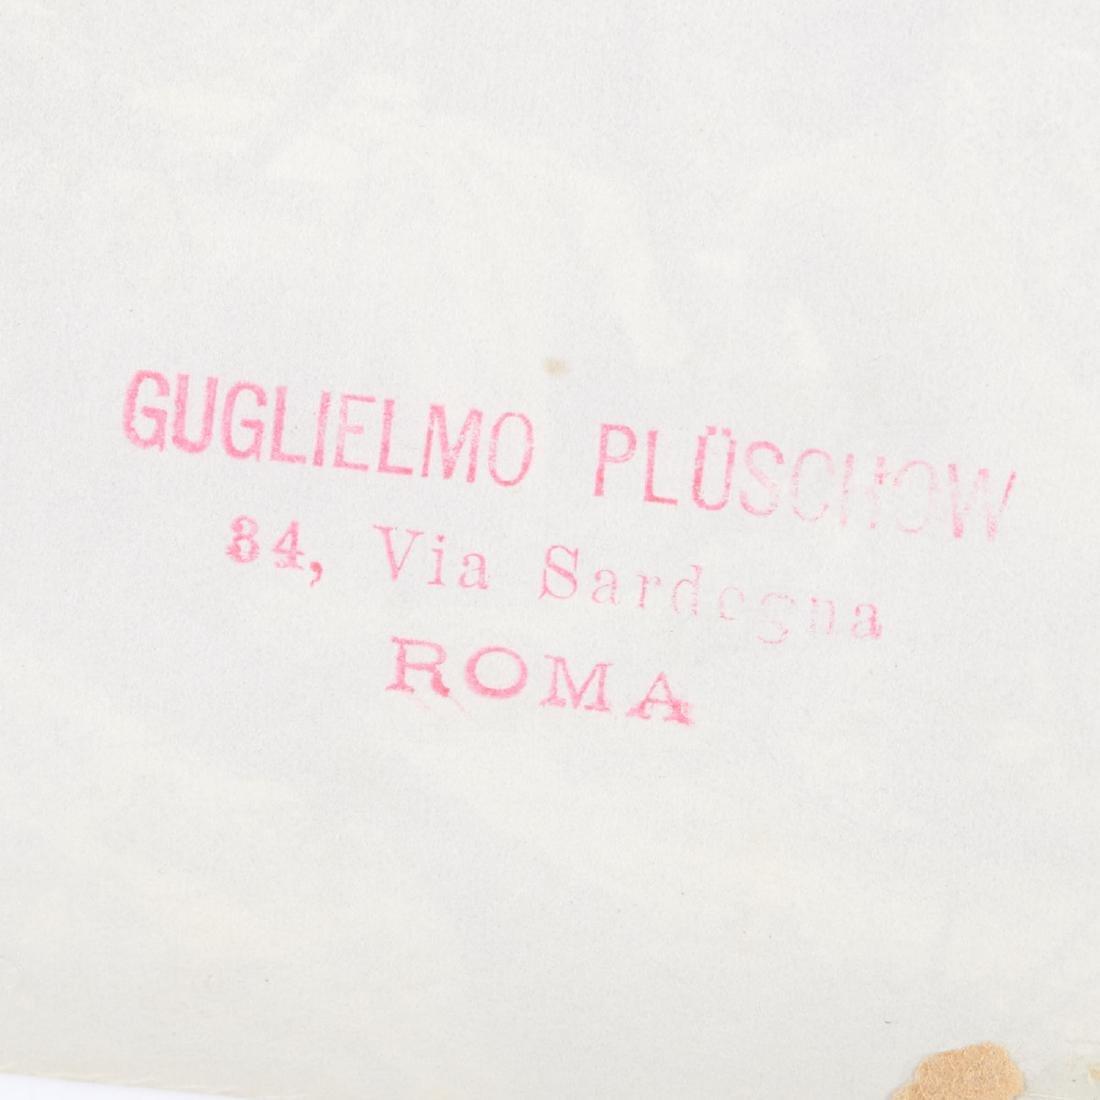 Guglielmo Pluschow, photograph - 5